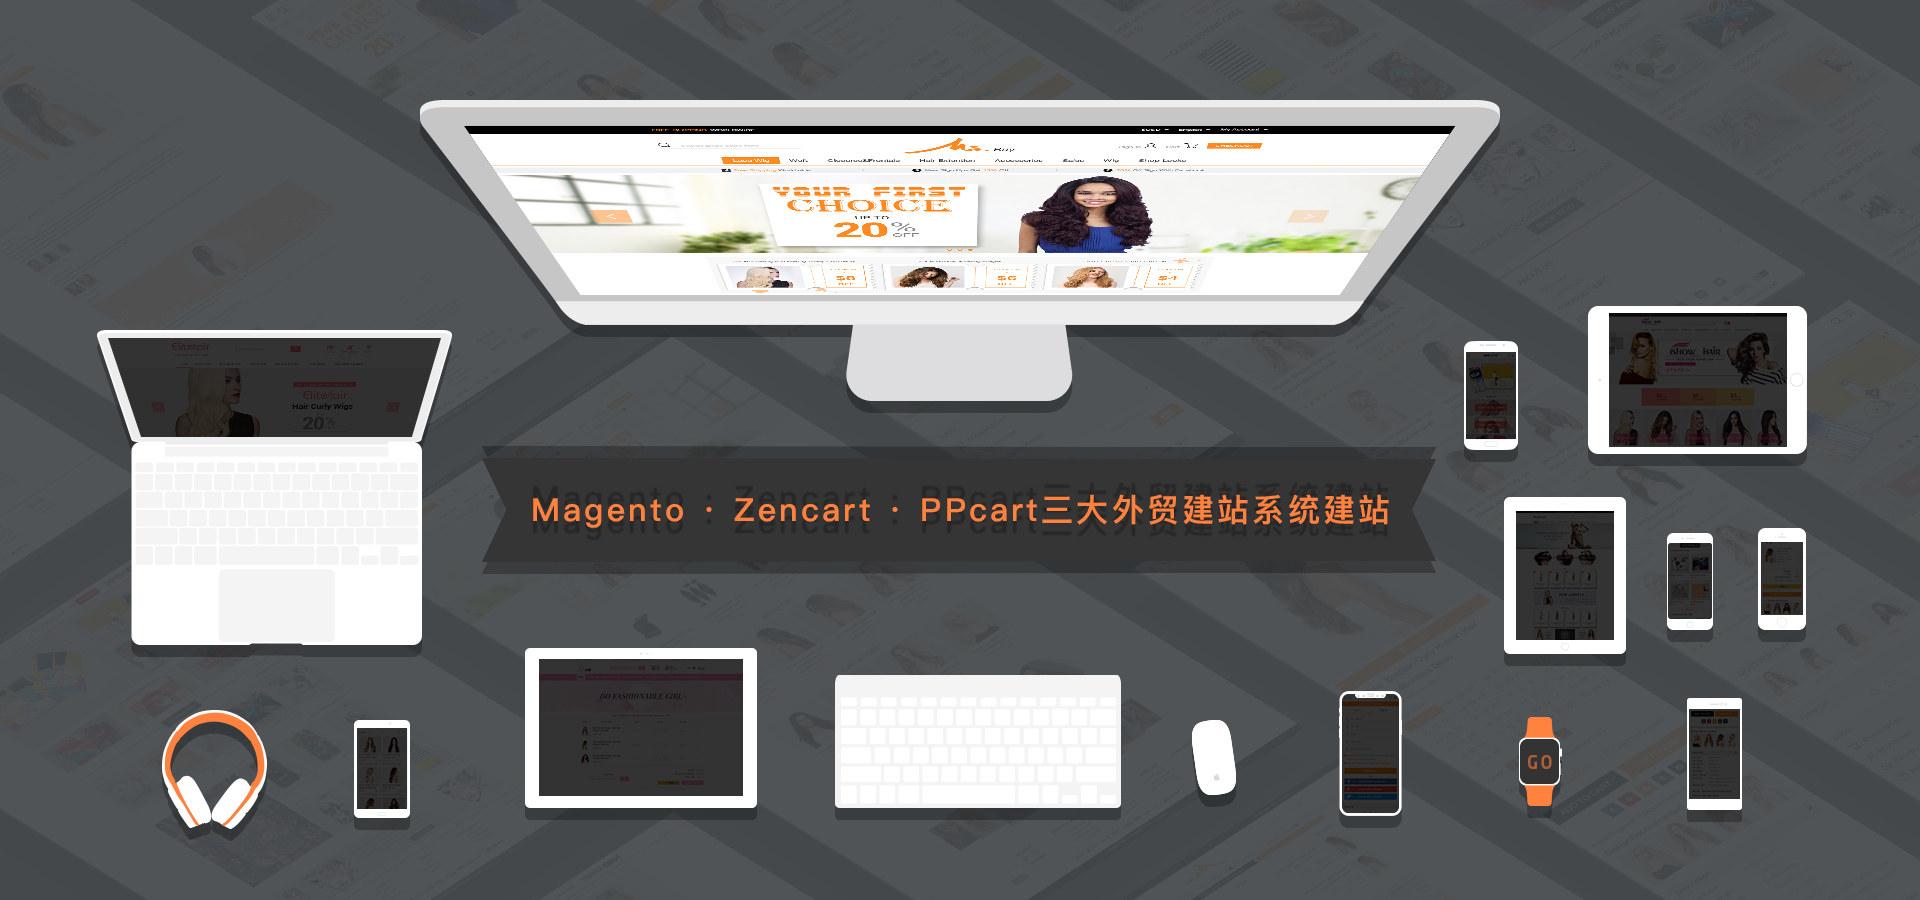 Magento Zencart PPcart三大外贸建站系统建站